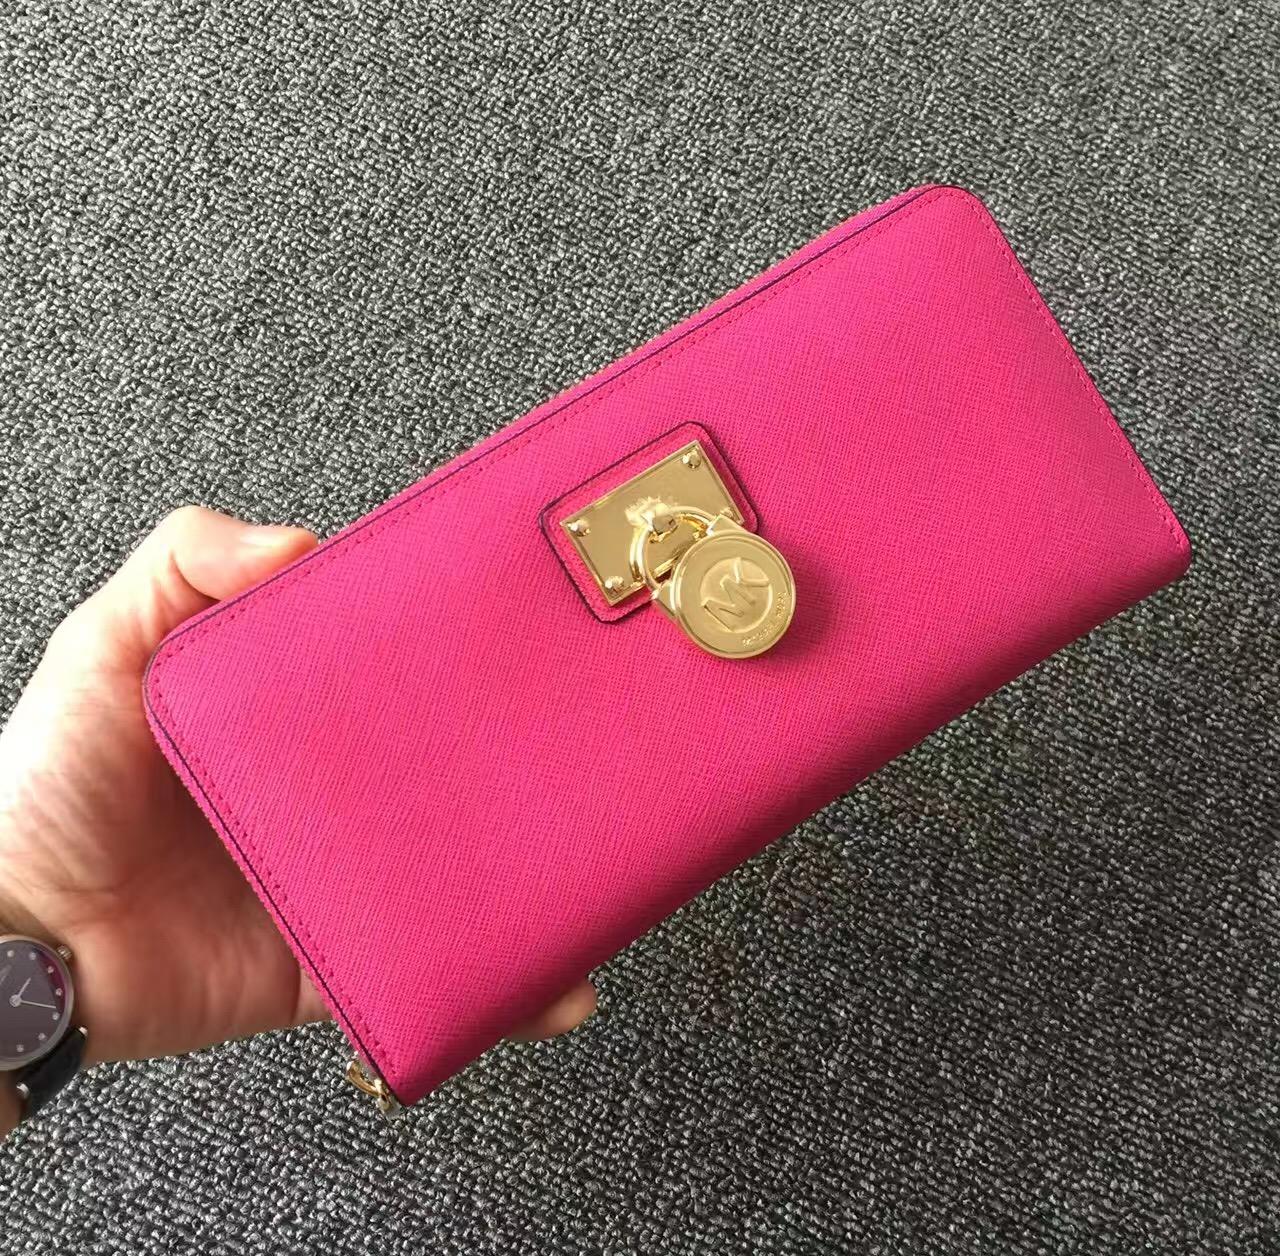 2017 New Michael Kors Lock Women Small Wallets Pink